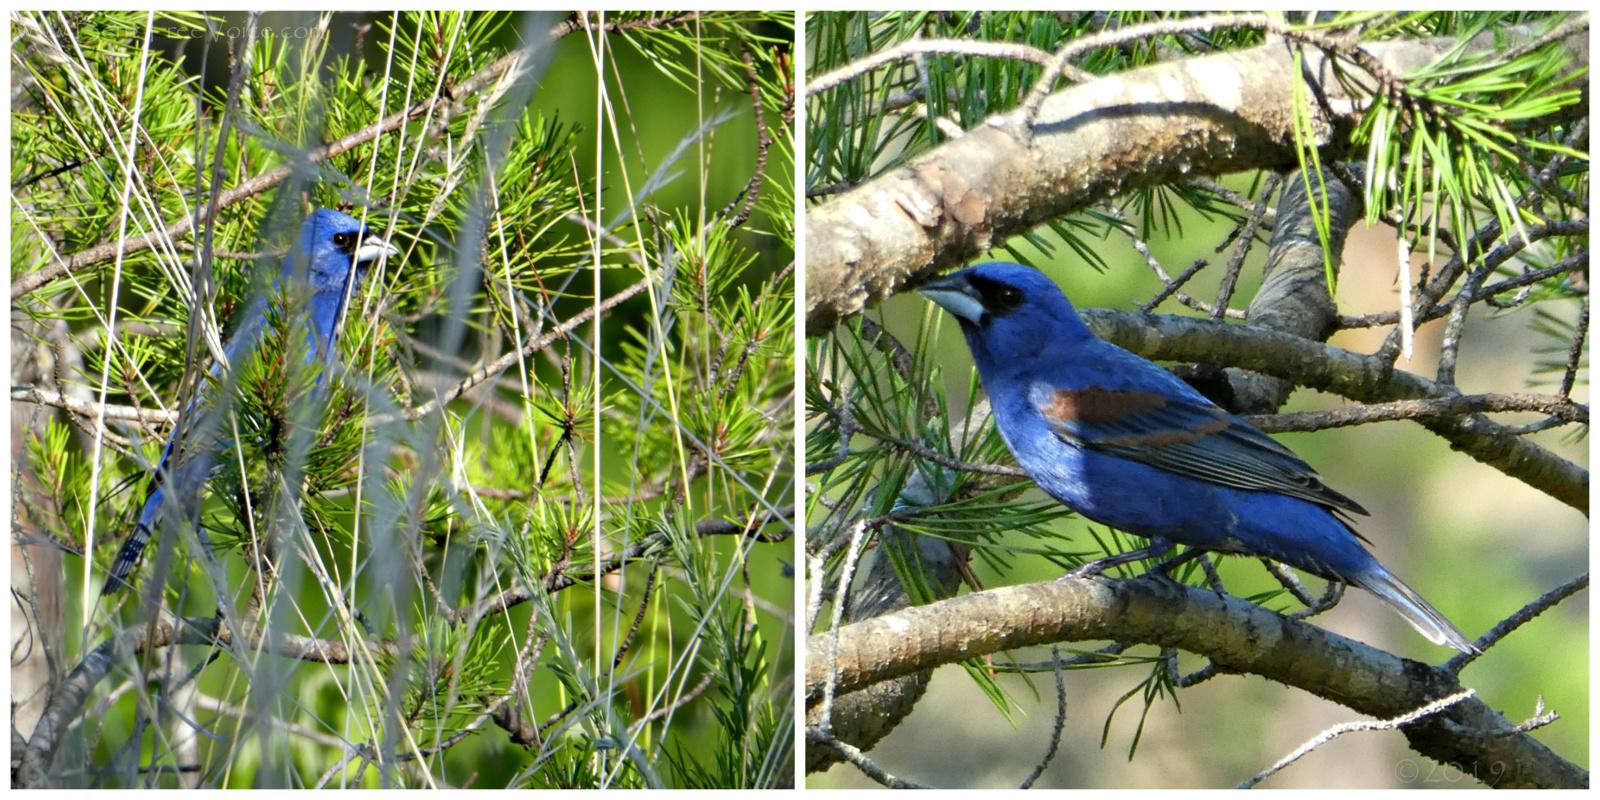 May 25, 2019 - Blue Grosbeak in Bent Tree